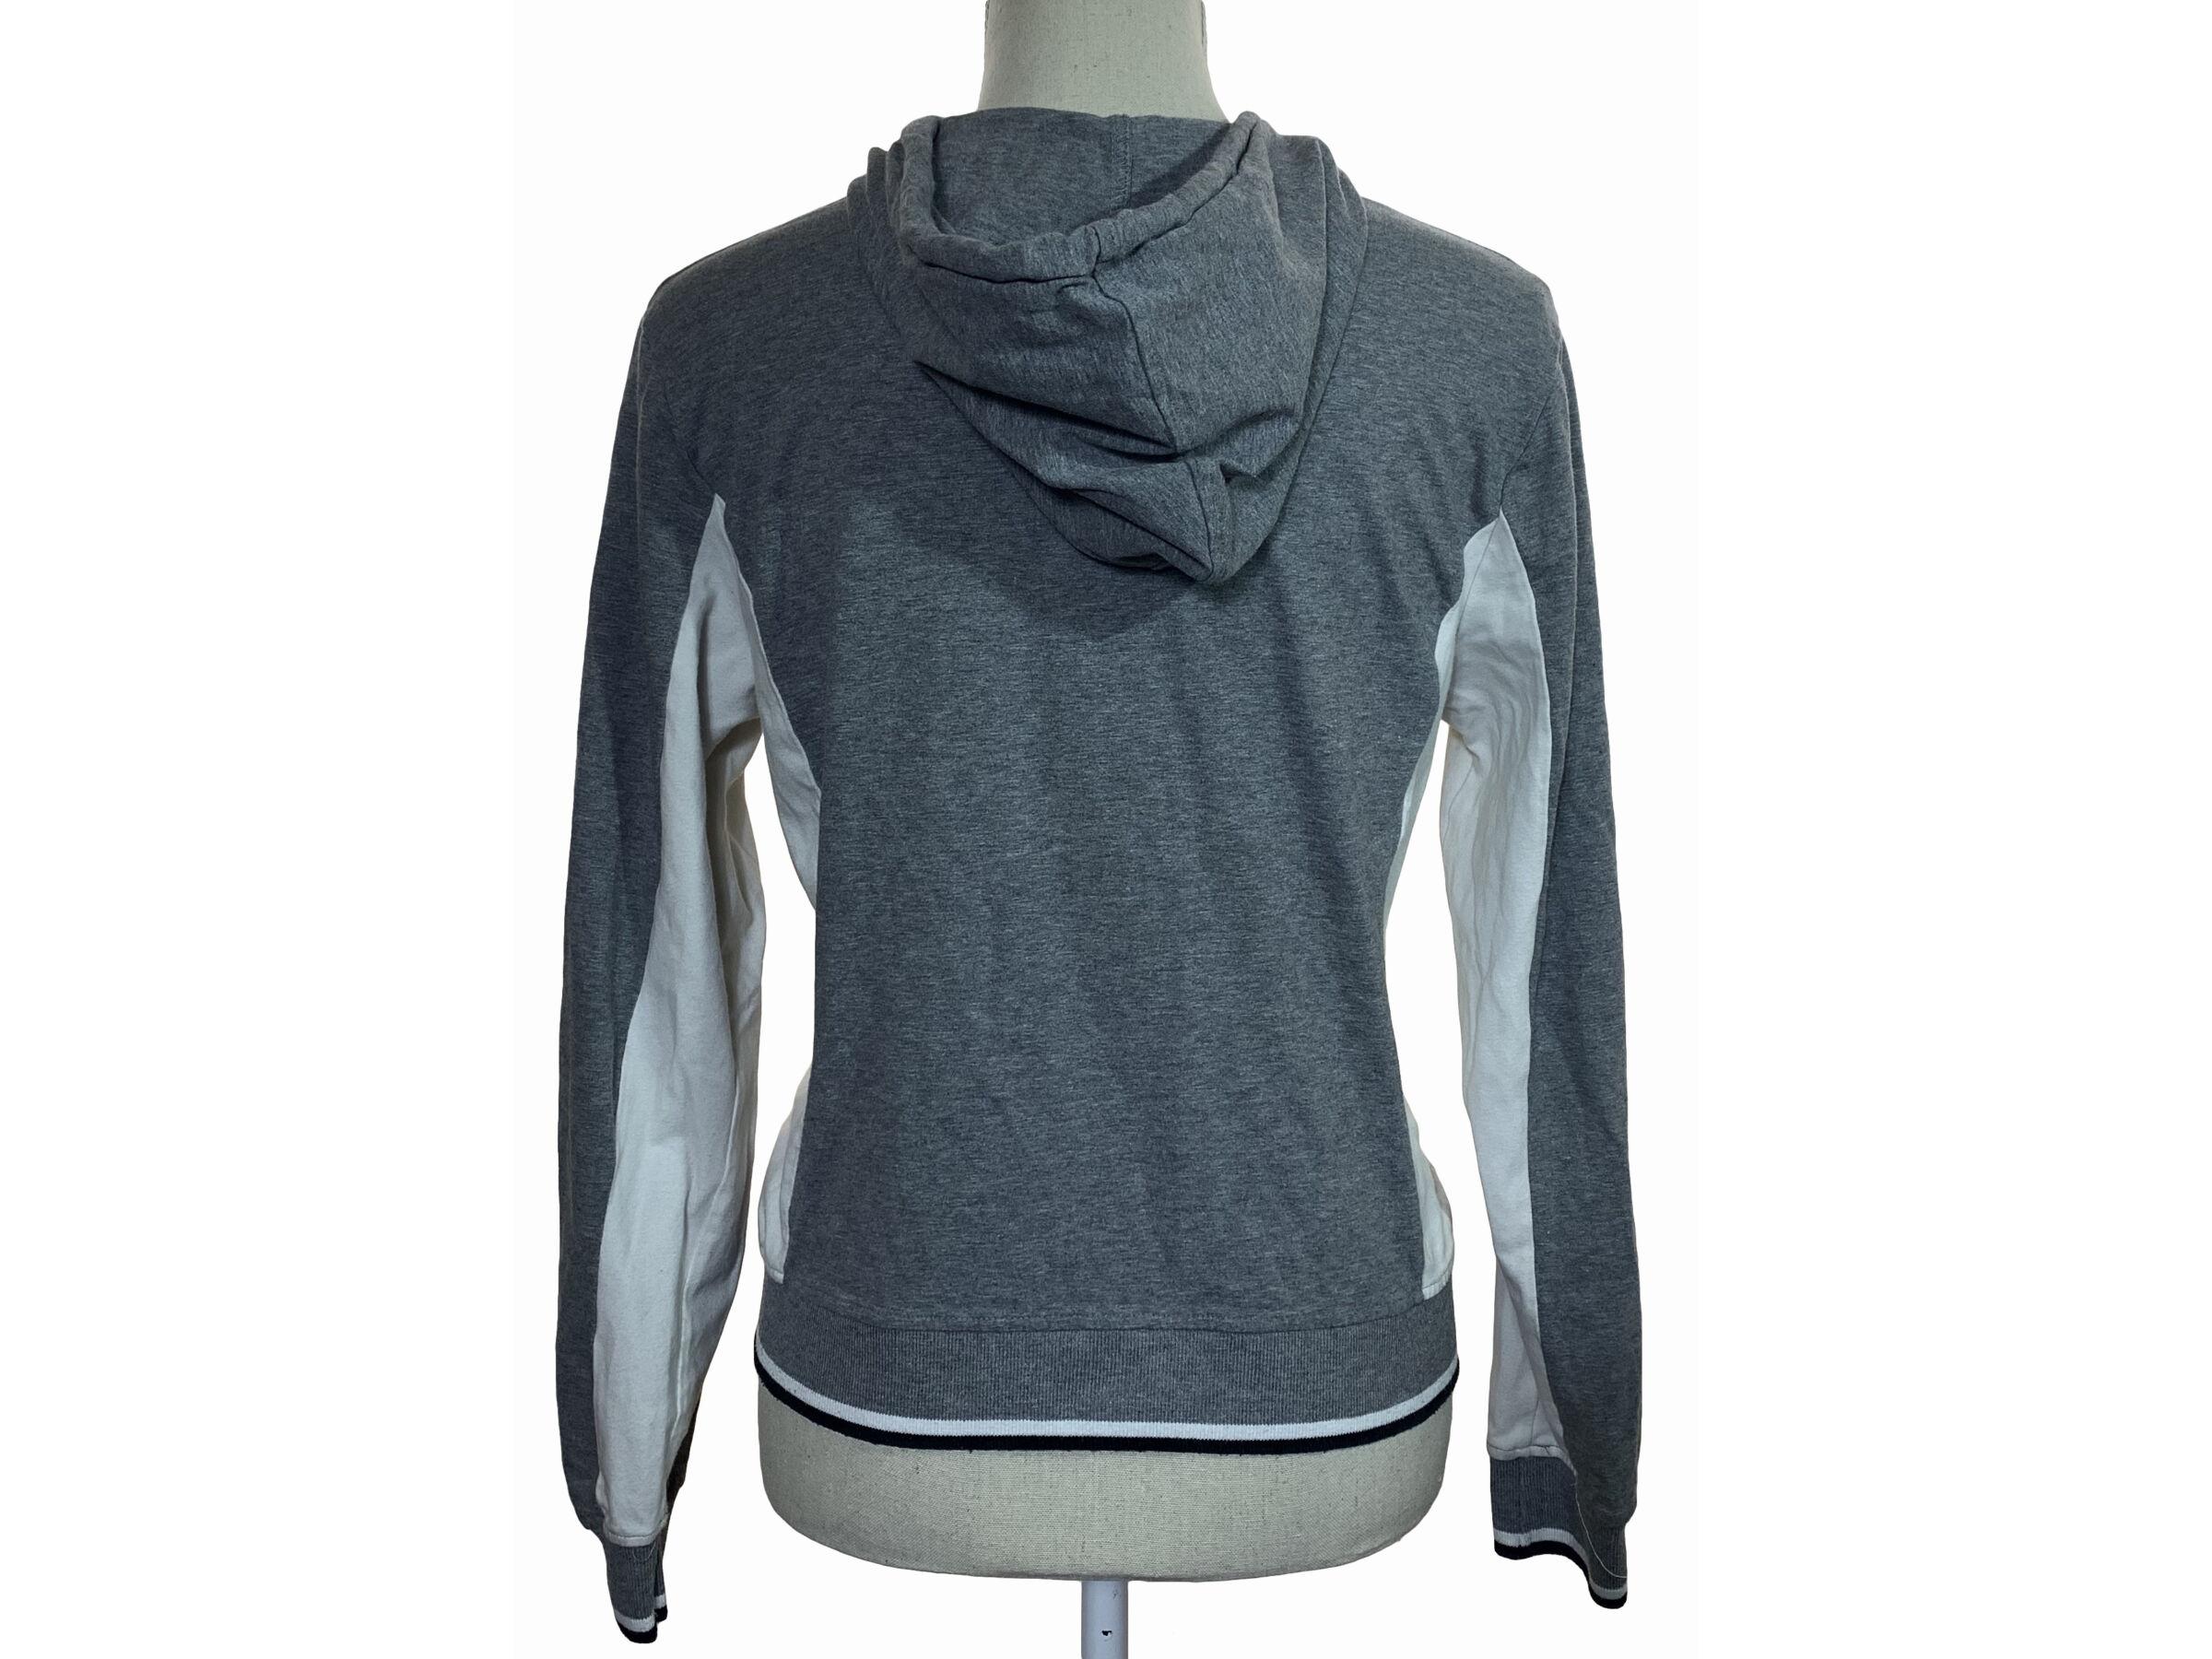 Everlast cipzáros pulóver (S)